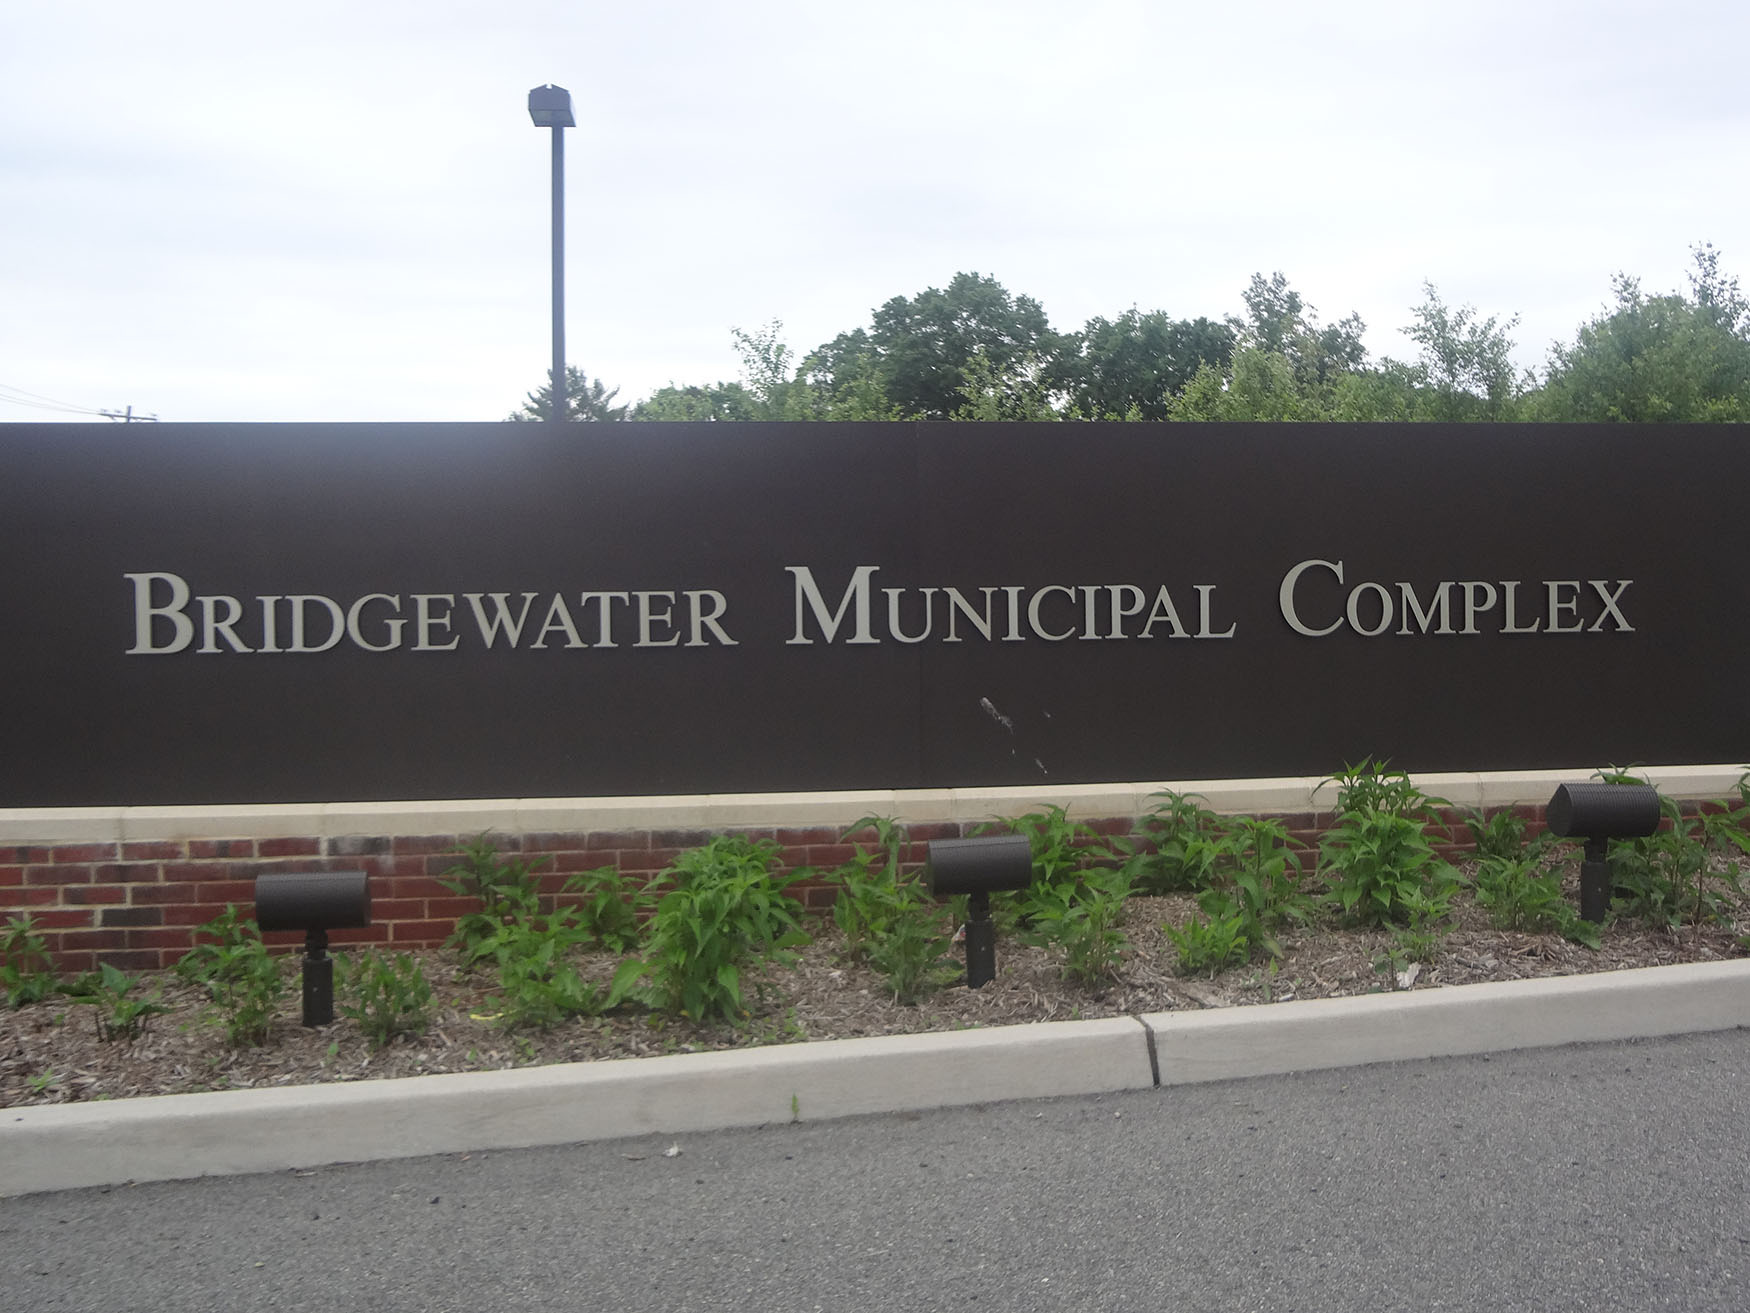 33814a02b538647cb0cc_Bridgewater_municipal.jpg